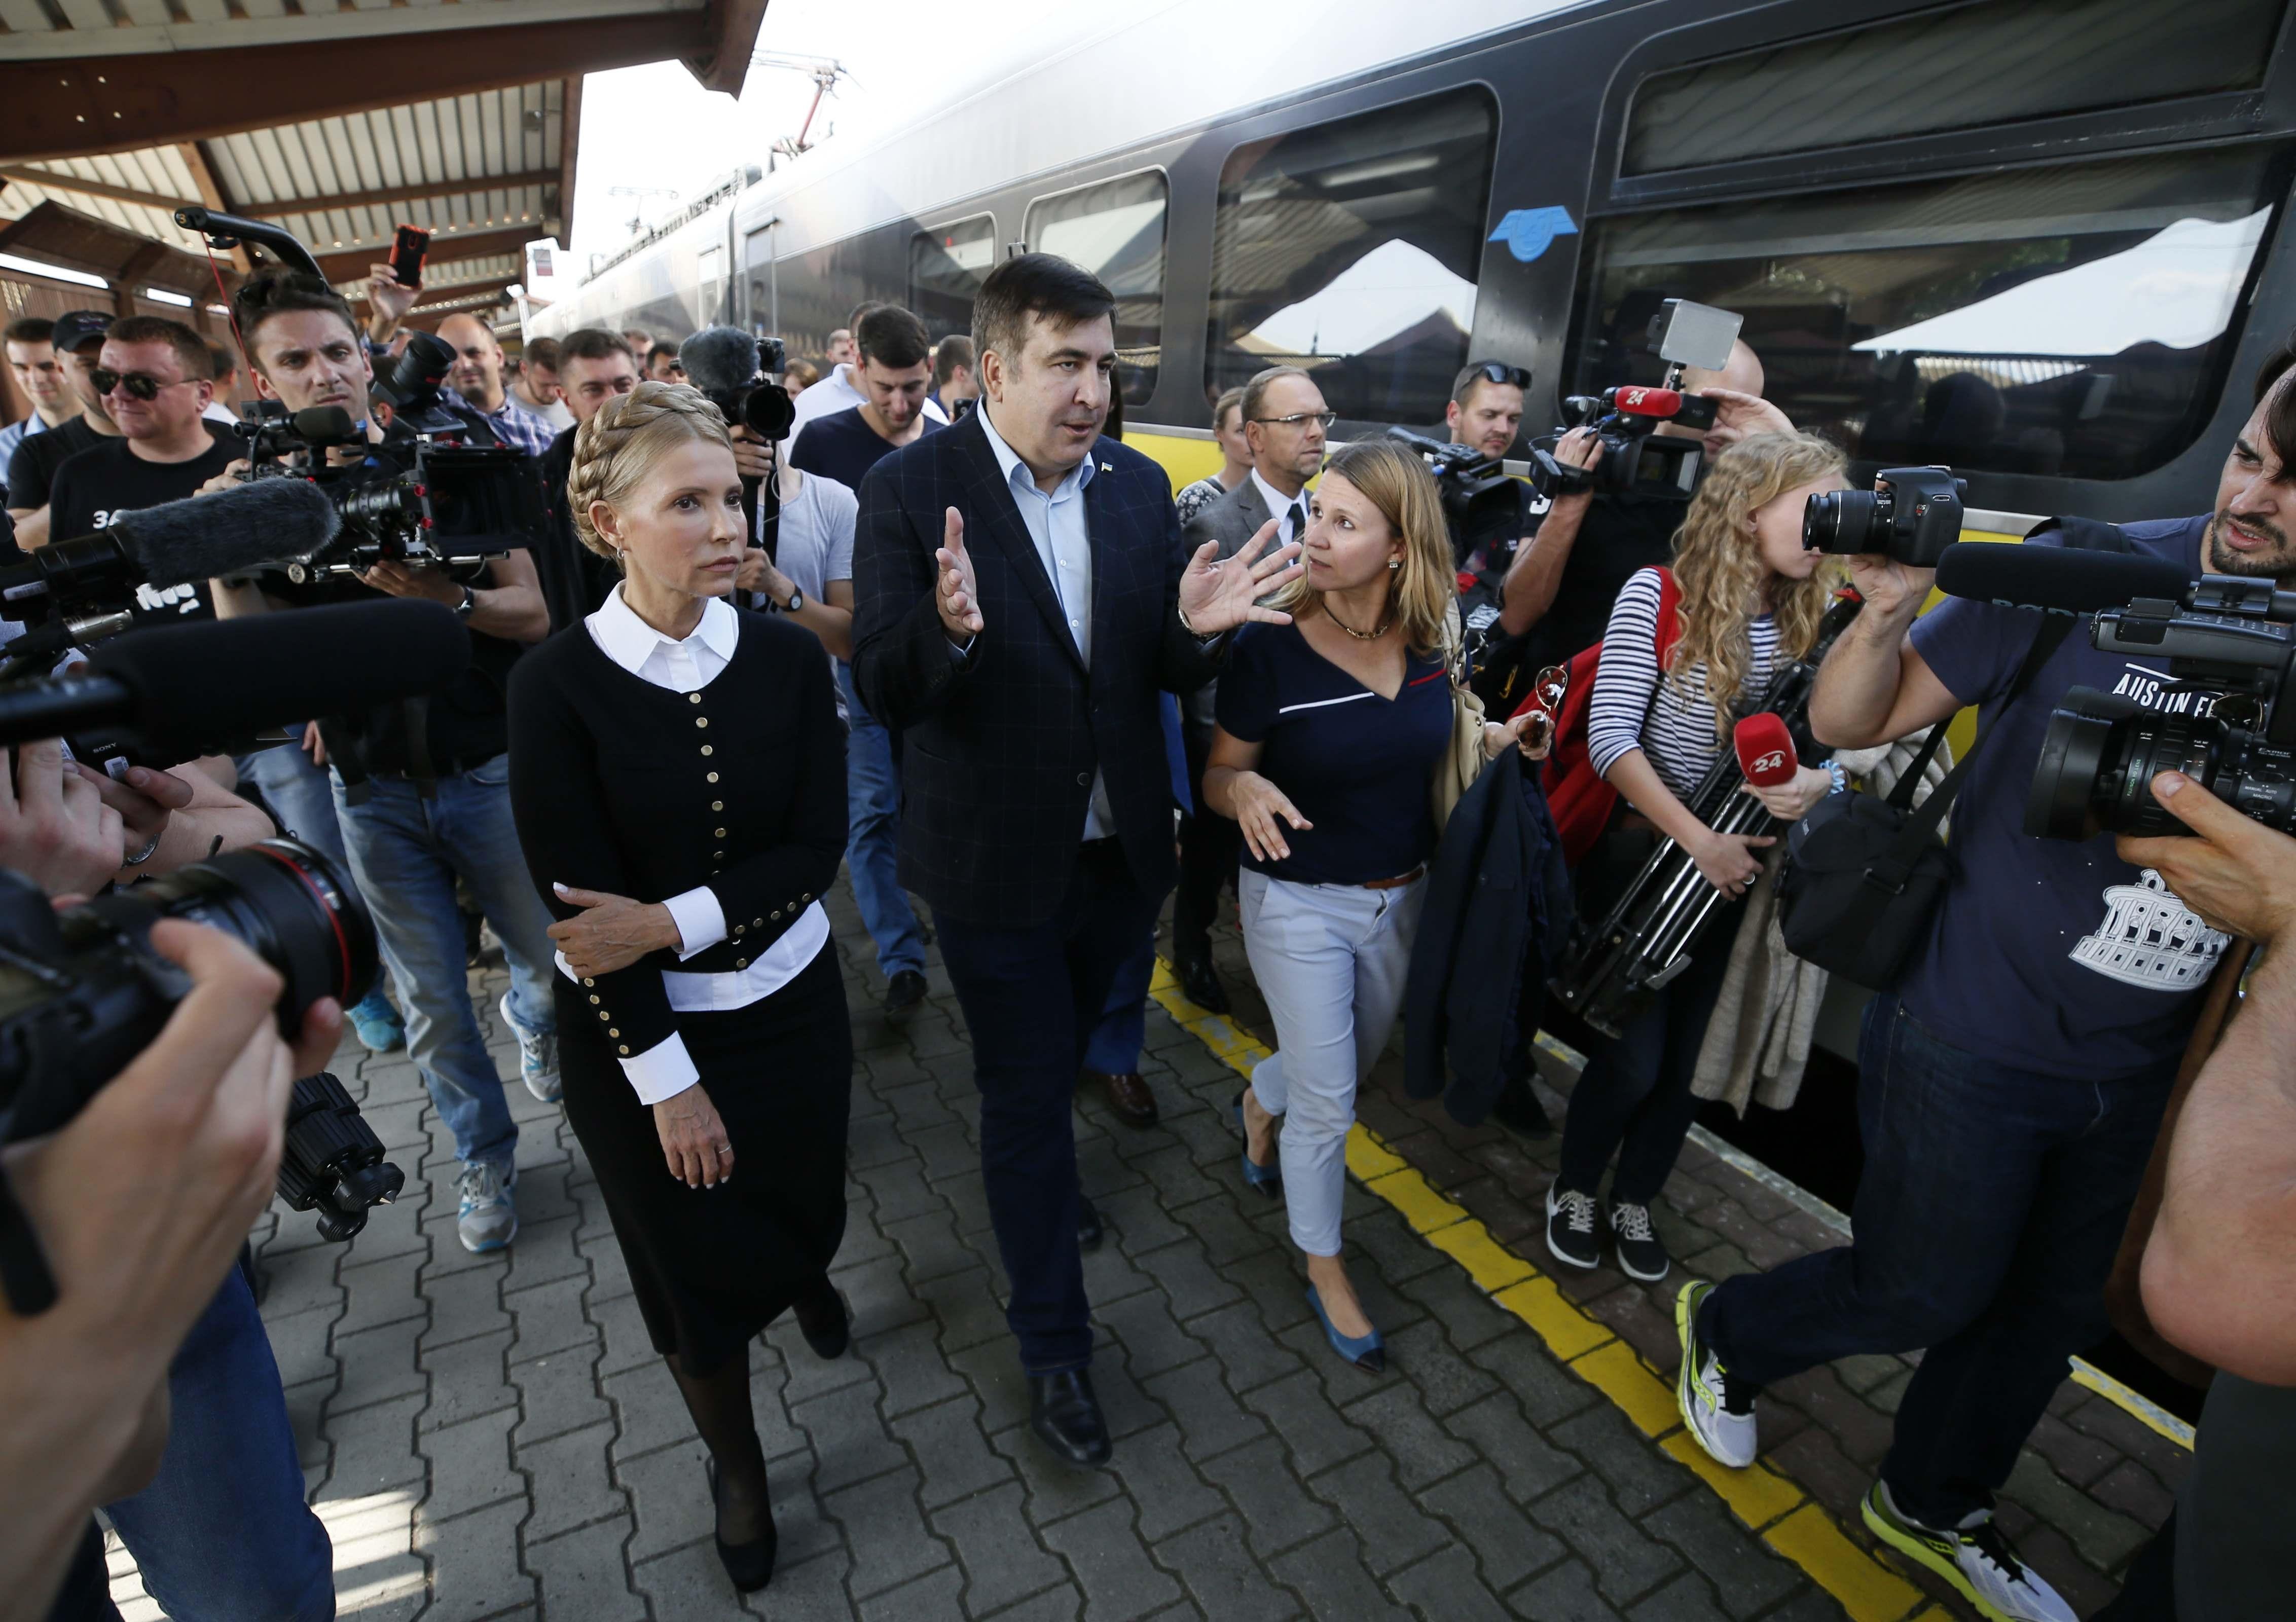 <p>Махиал Саакашвили. Фото: &copy; REUTERS/GLEB GARANICH</p>